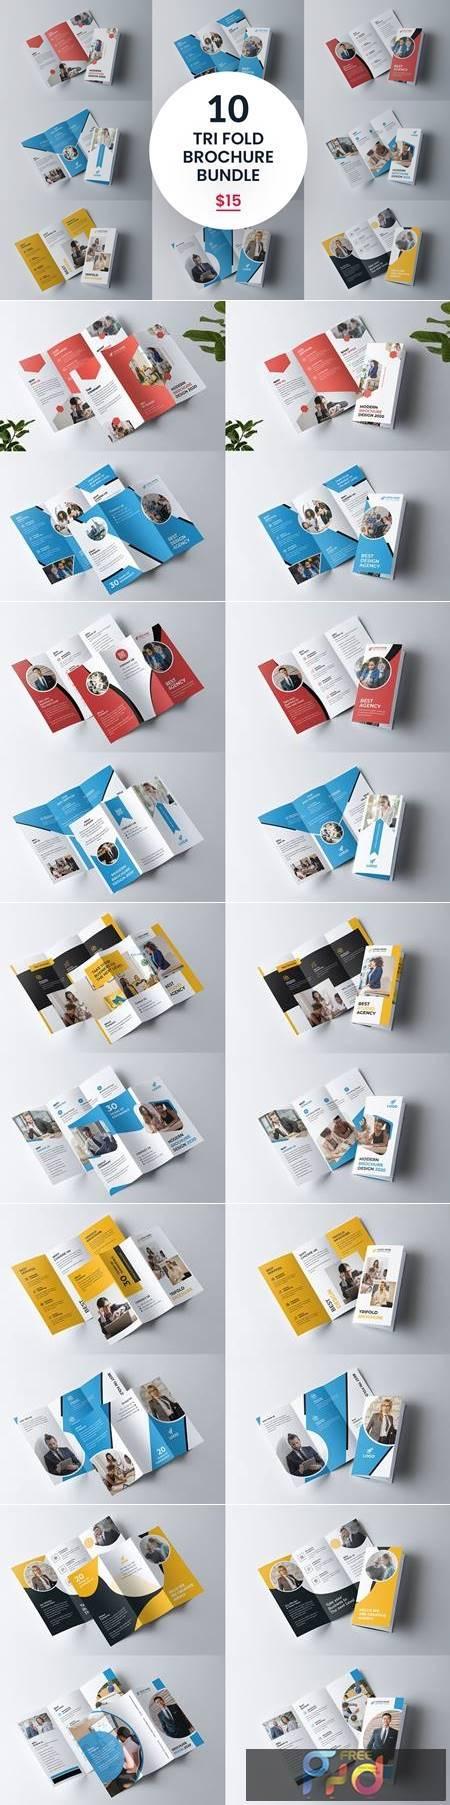 Tri fold Brochure Bundle 5487795 1